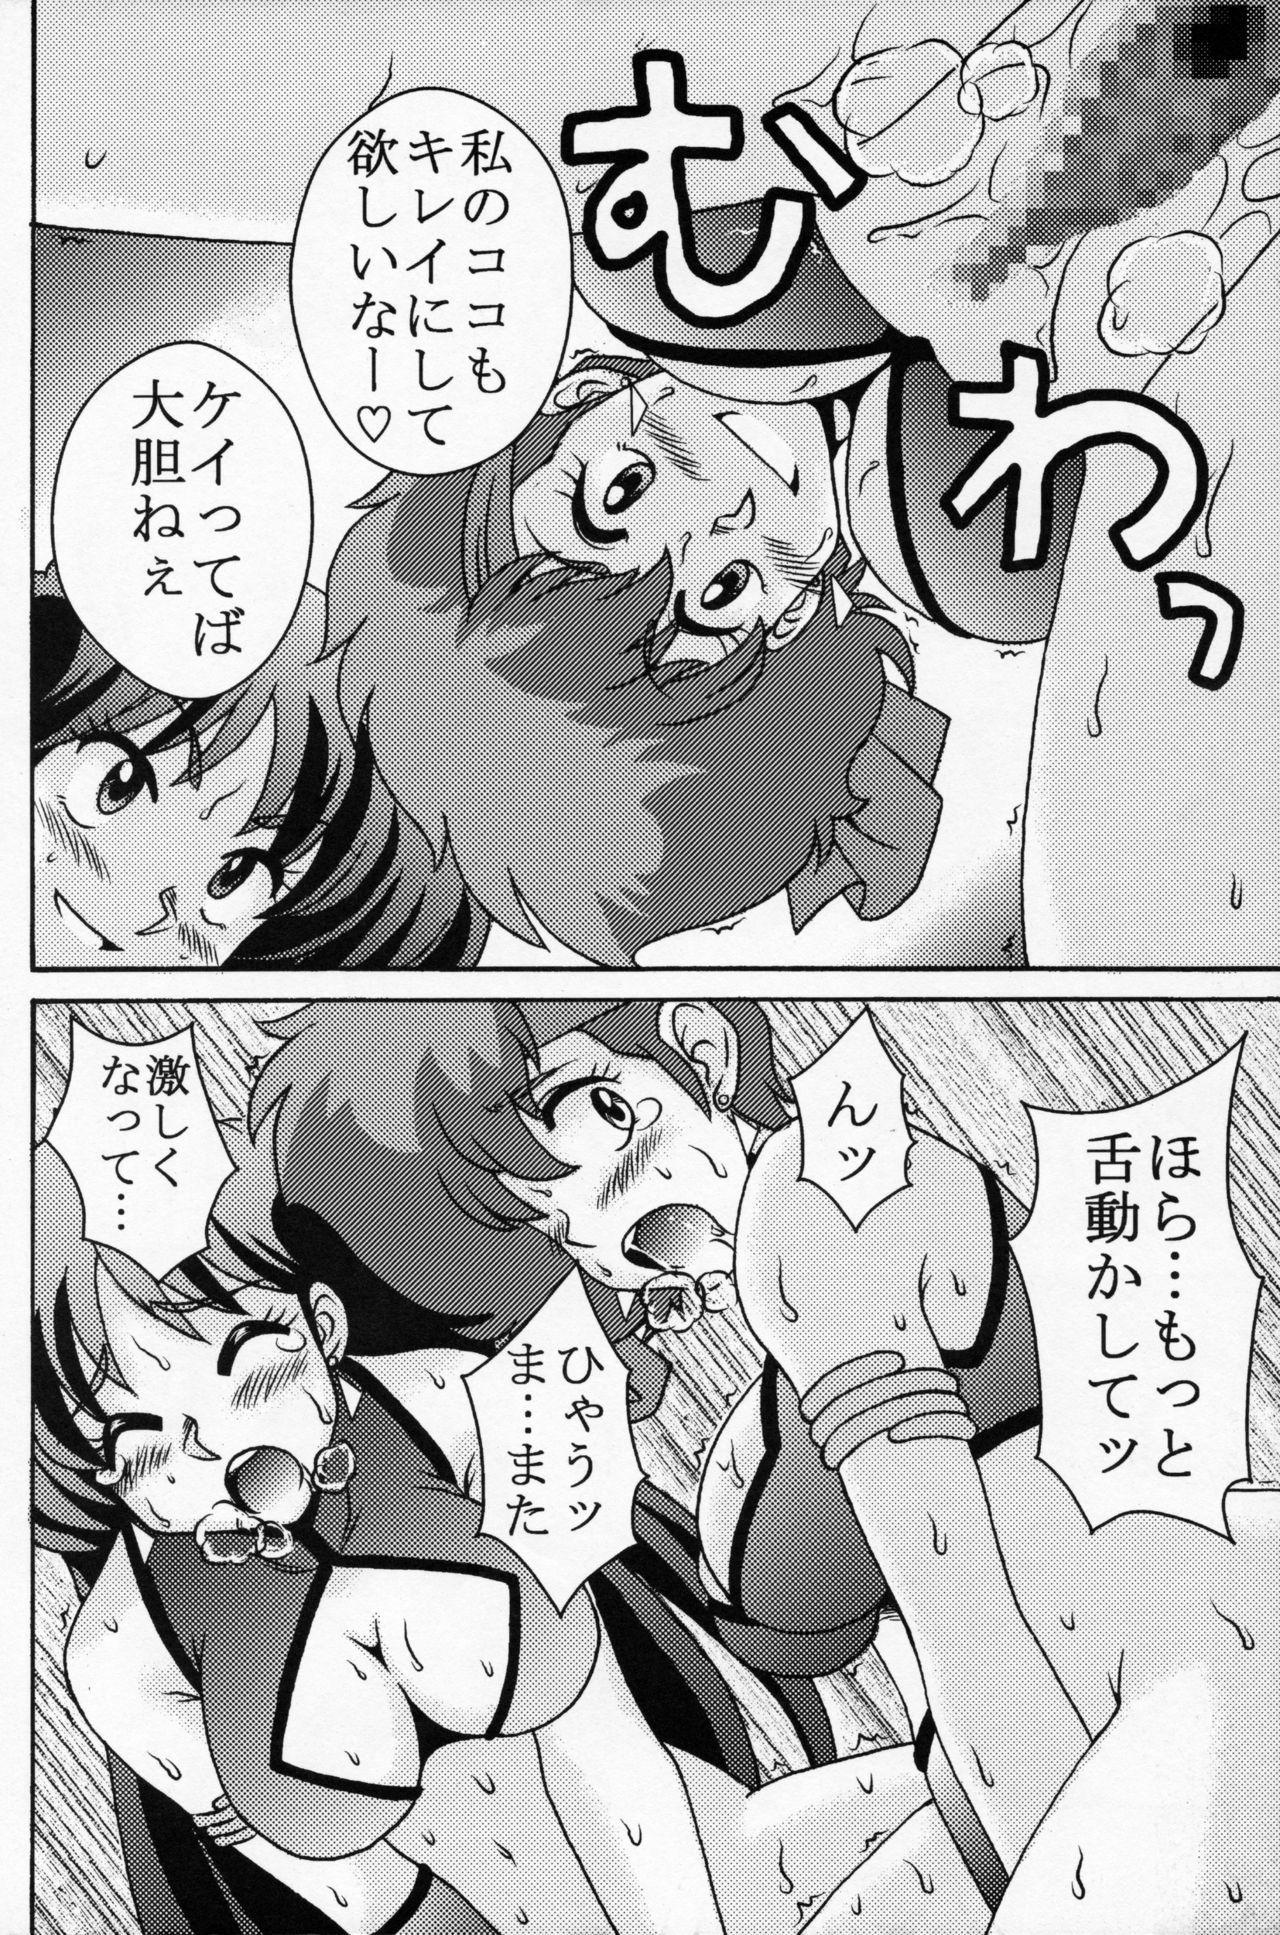 Kei to Yuri 22